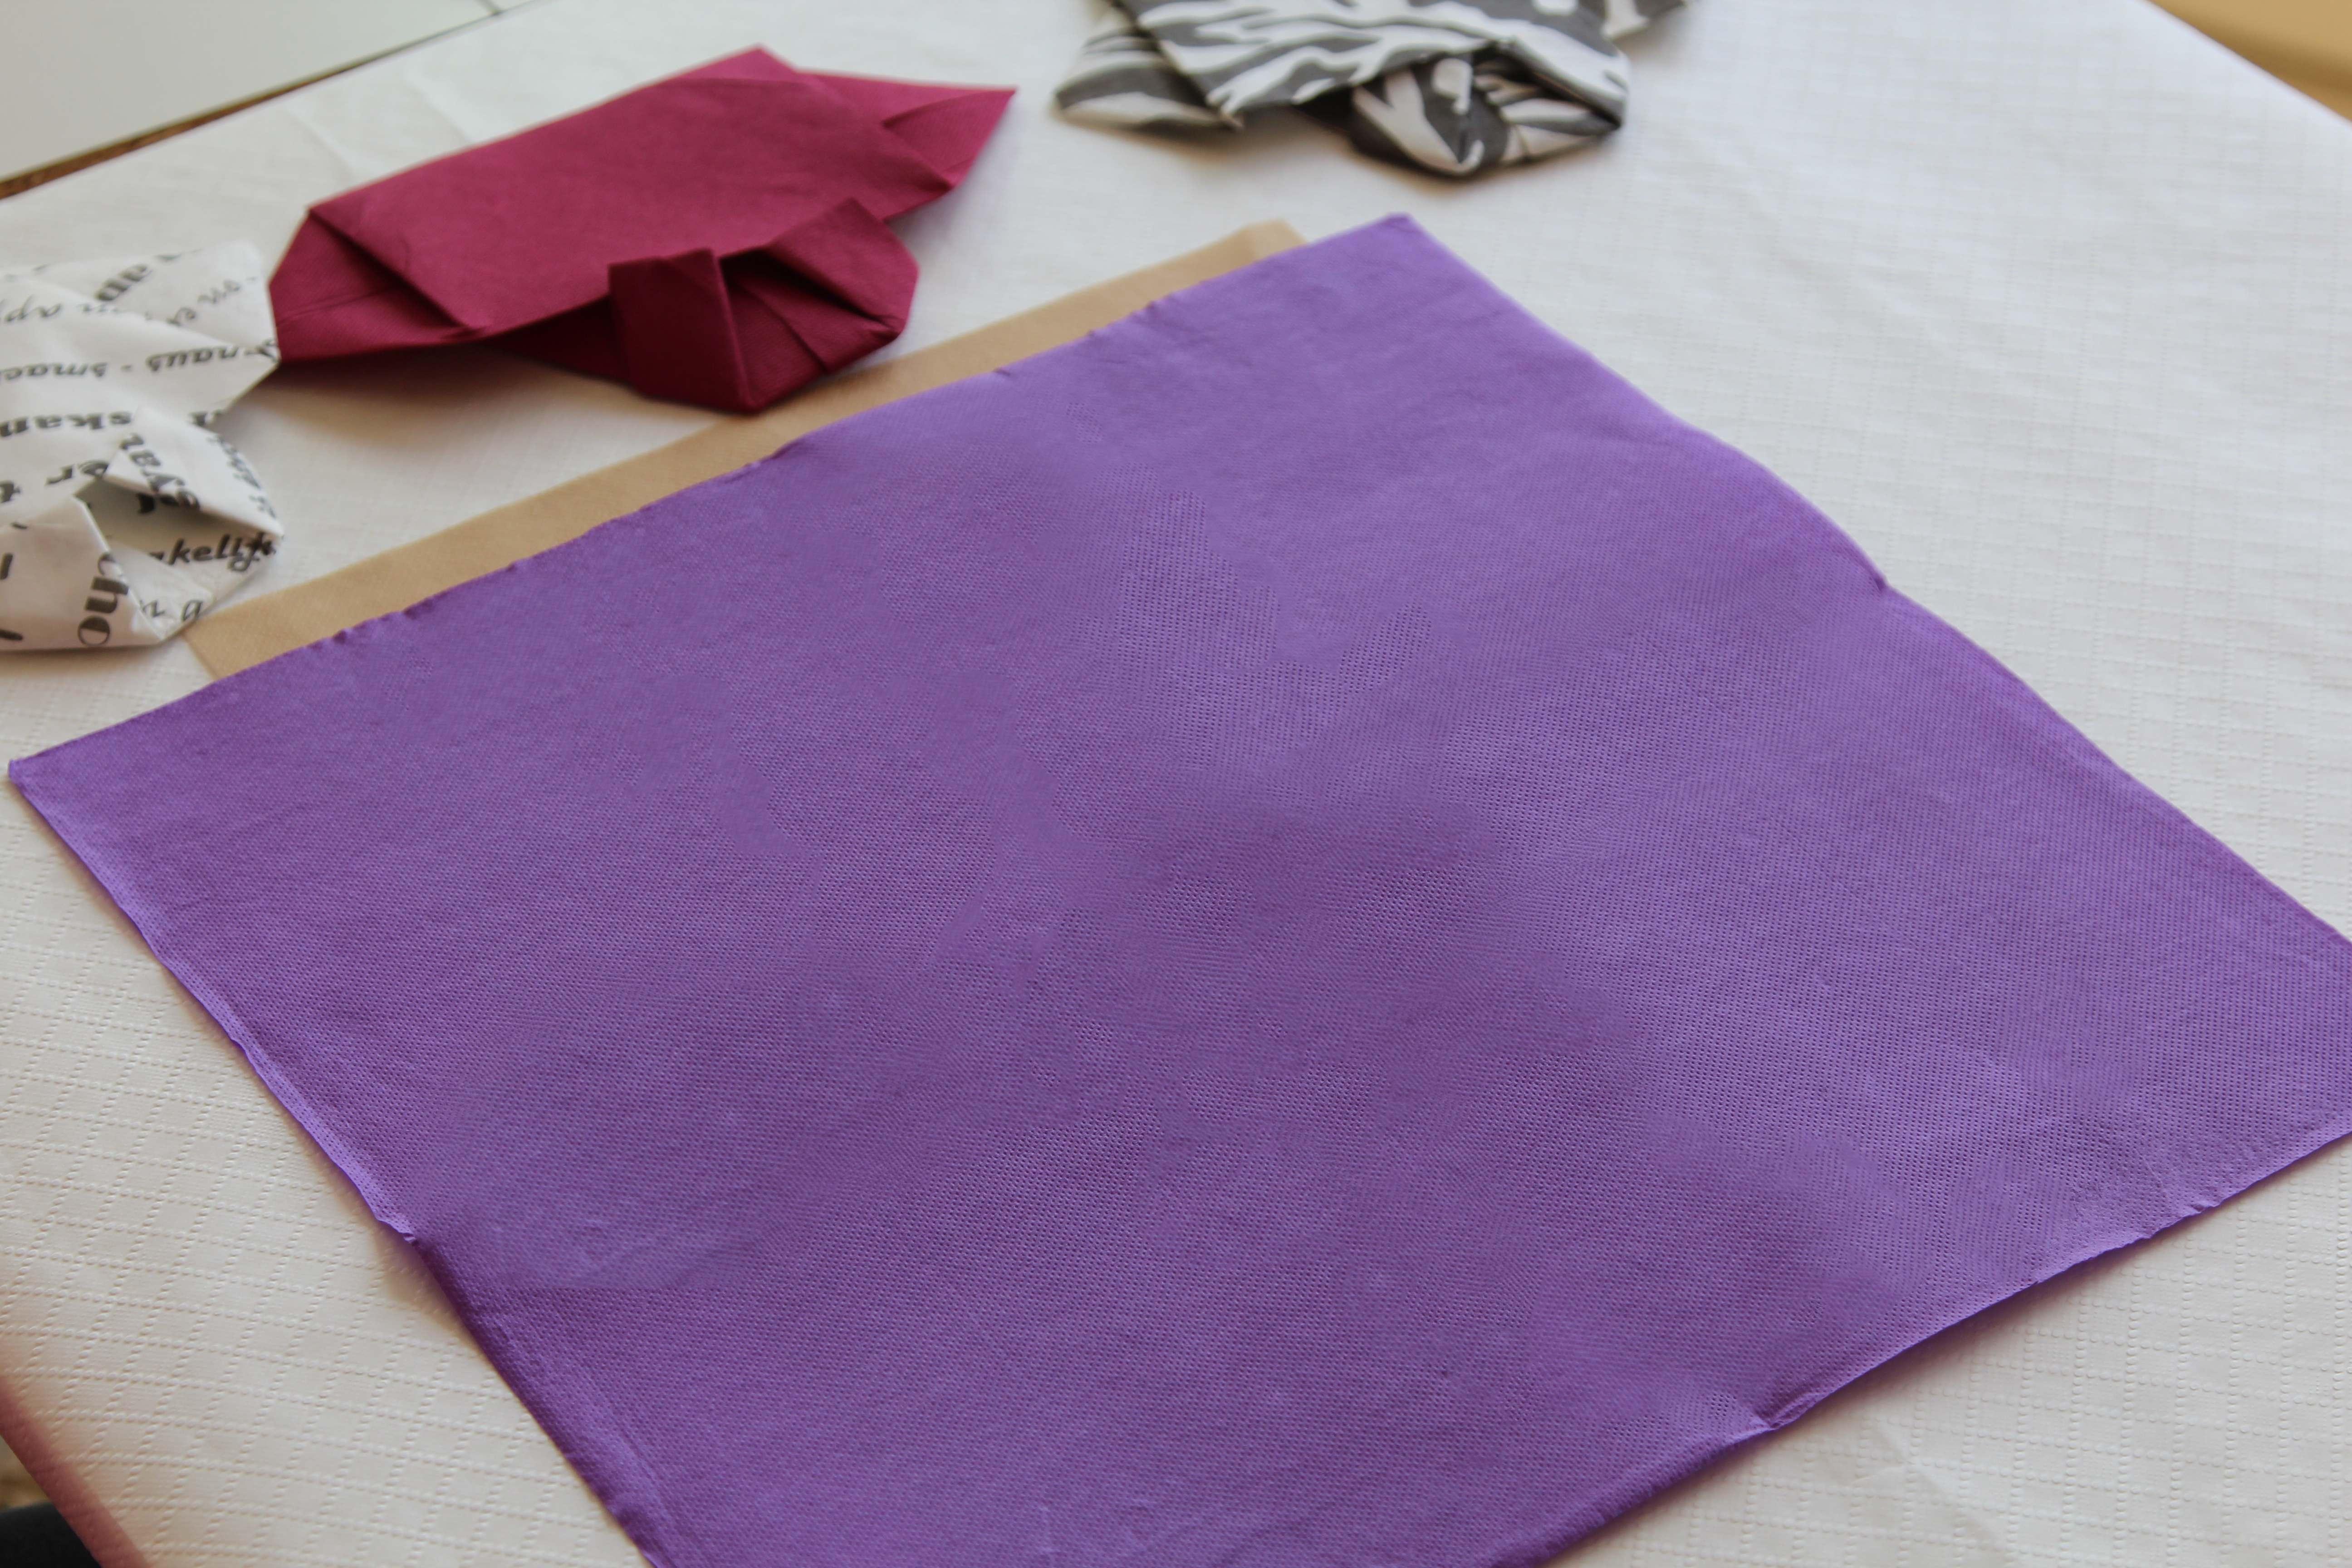 servilleta desplegada doblar servilletas de papel paso1